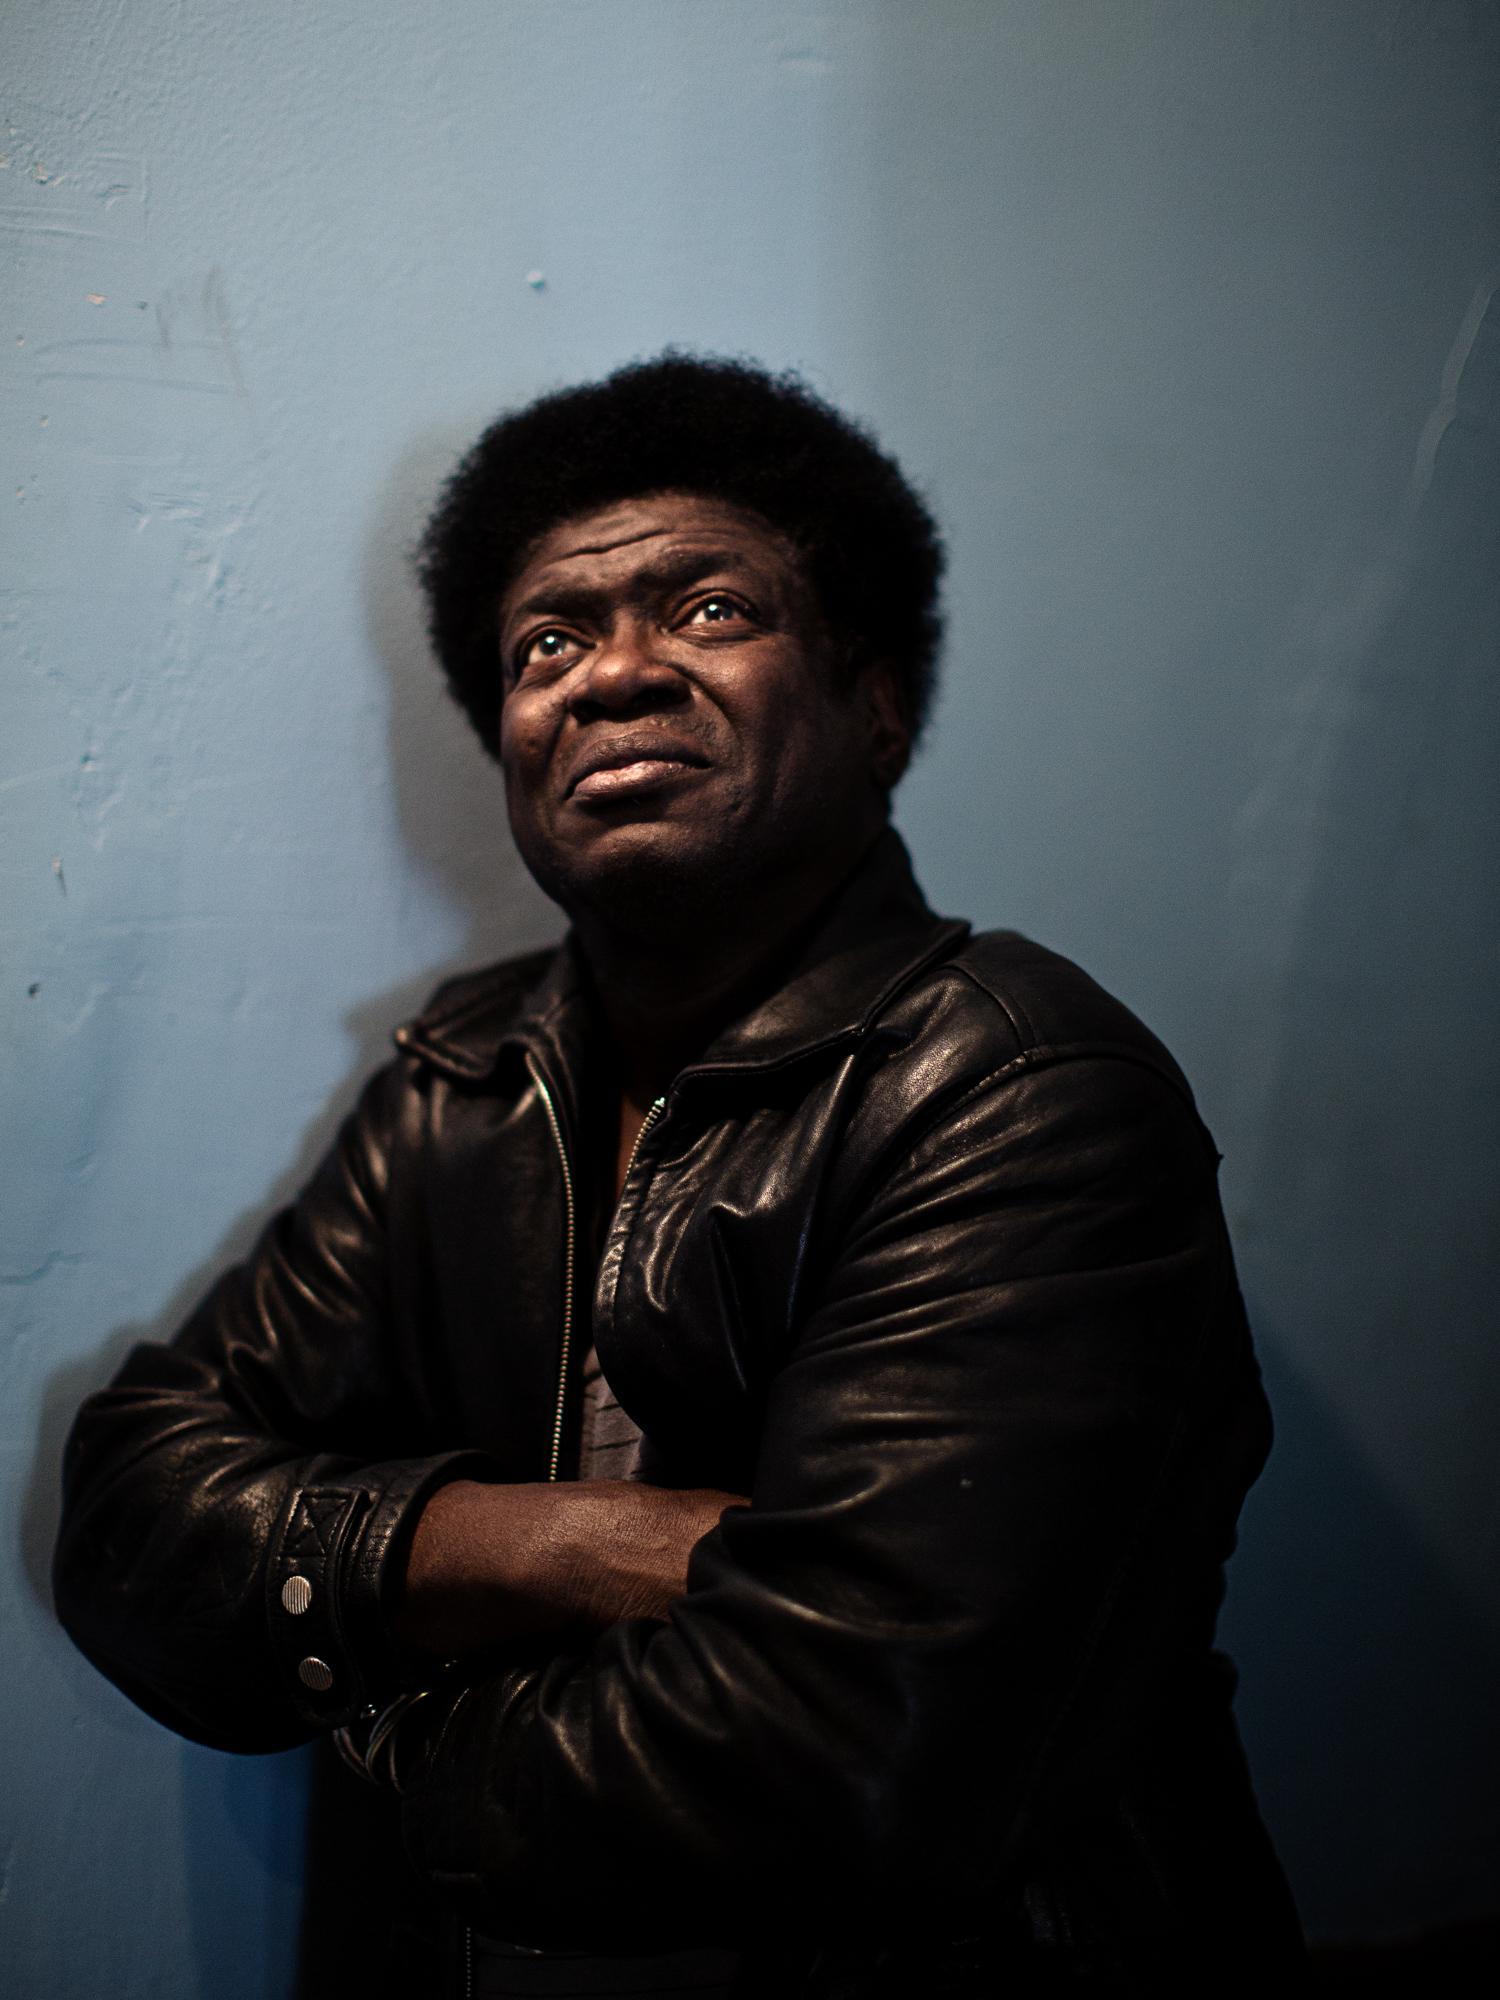 Singer Charles Bradley in Bushwick, Brooklyn.